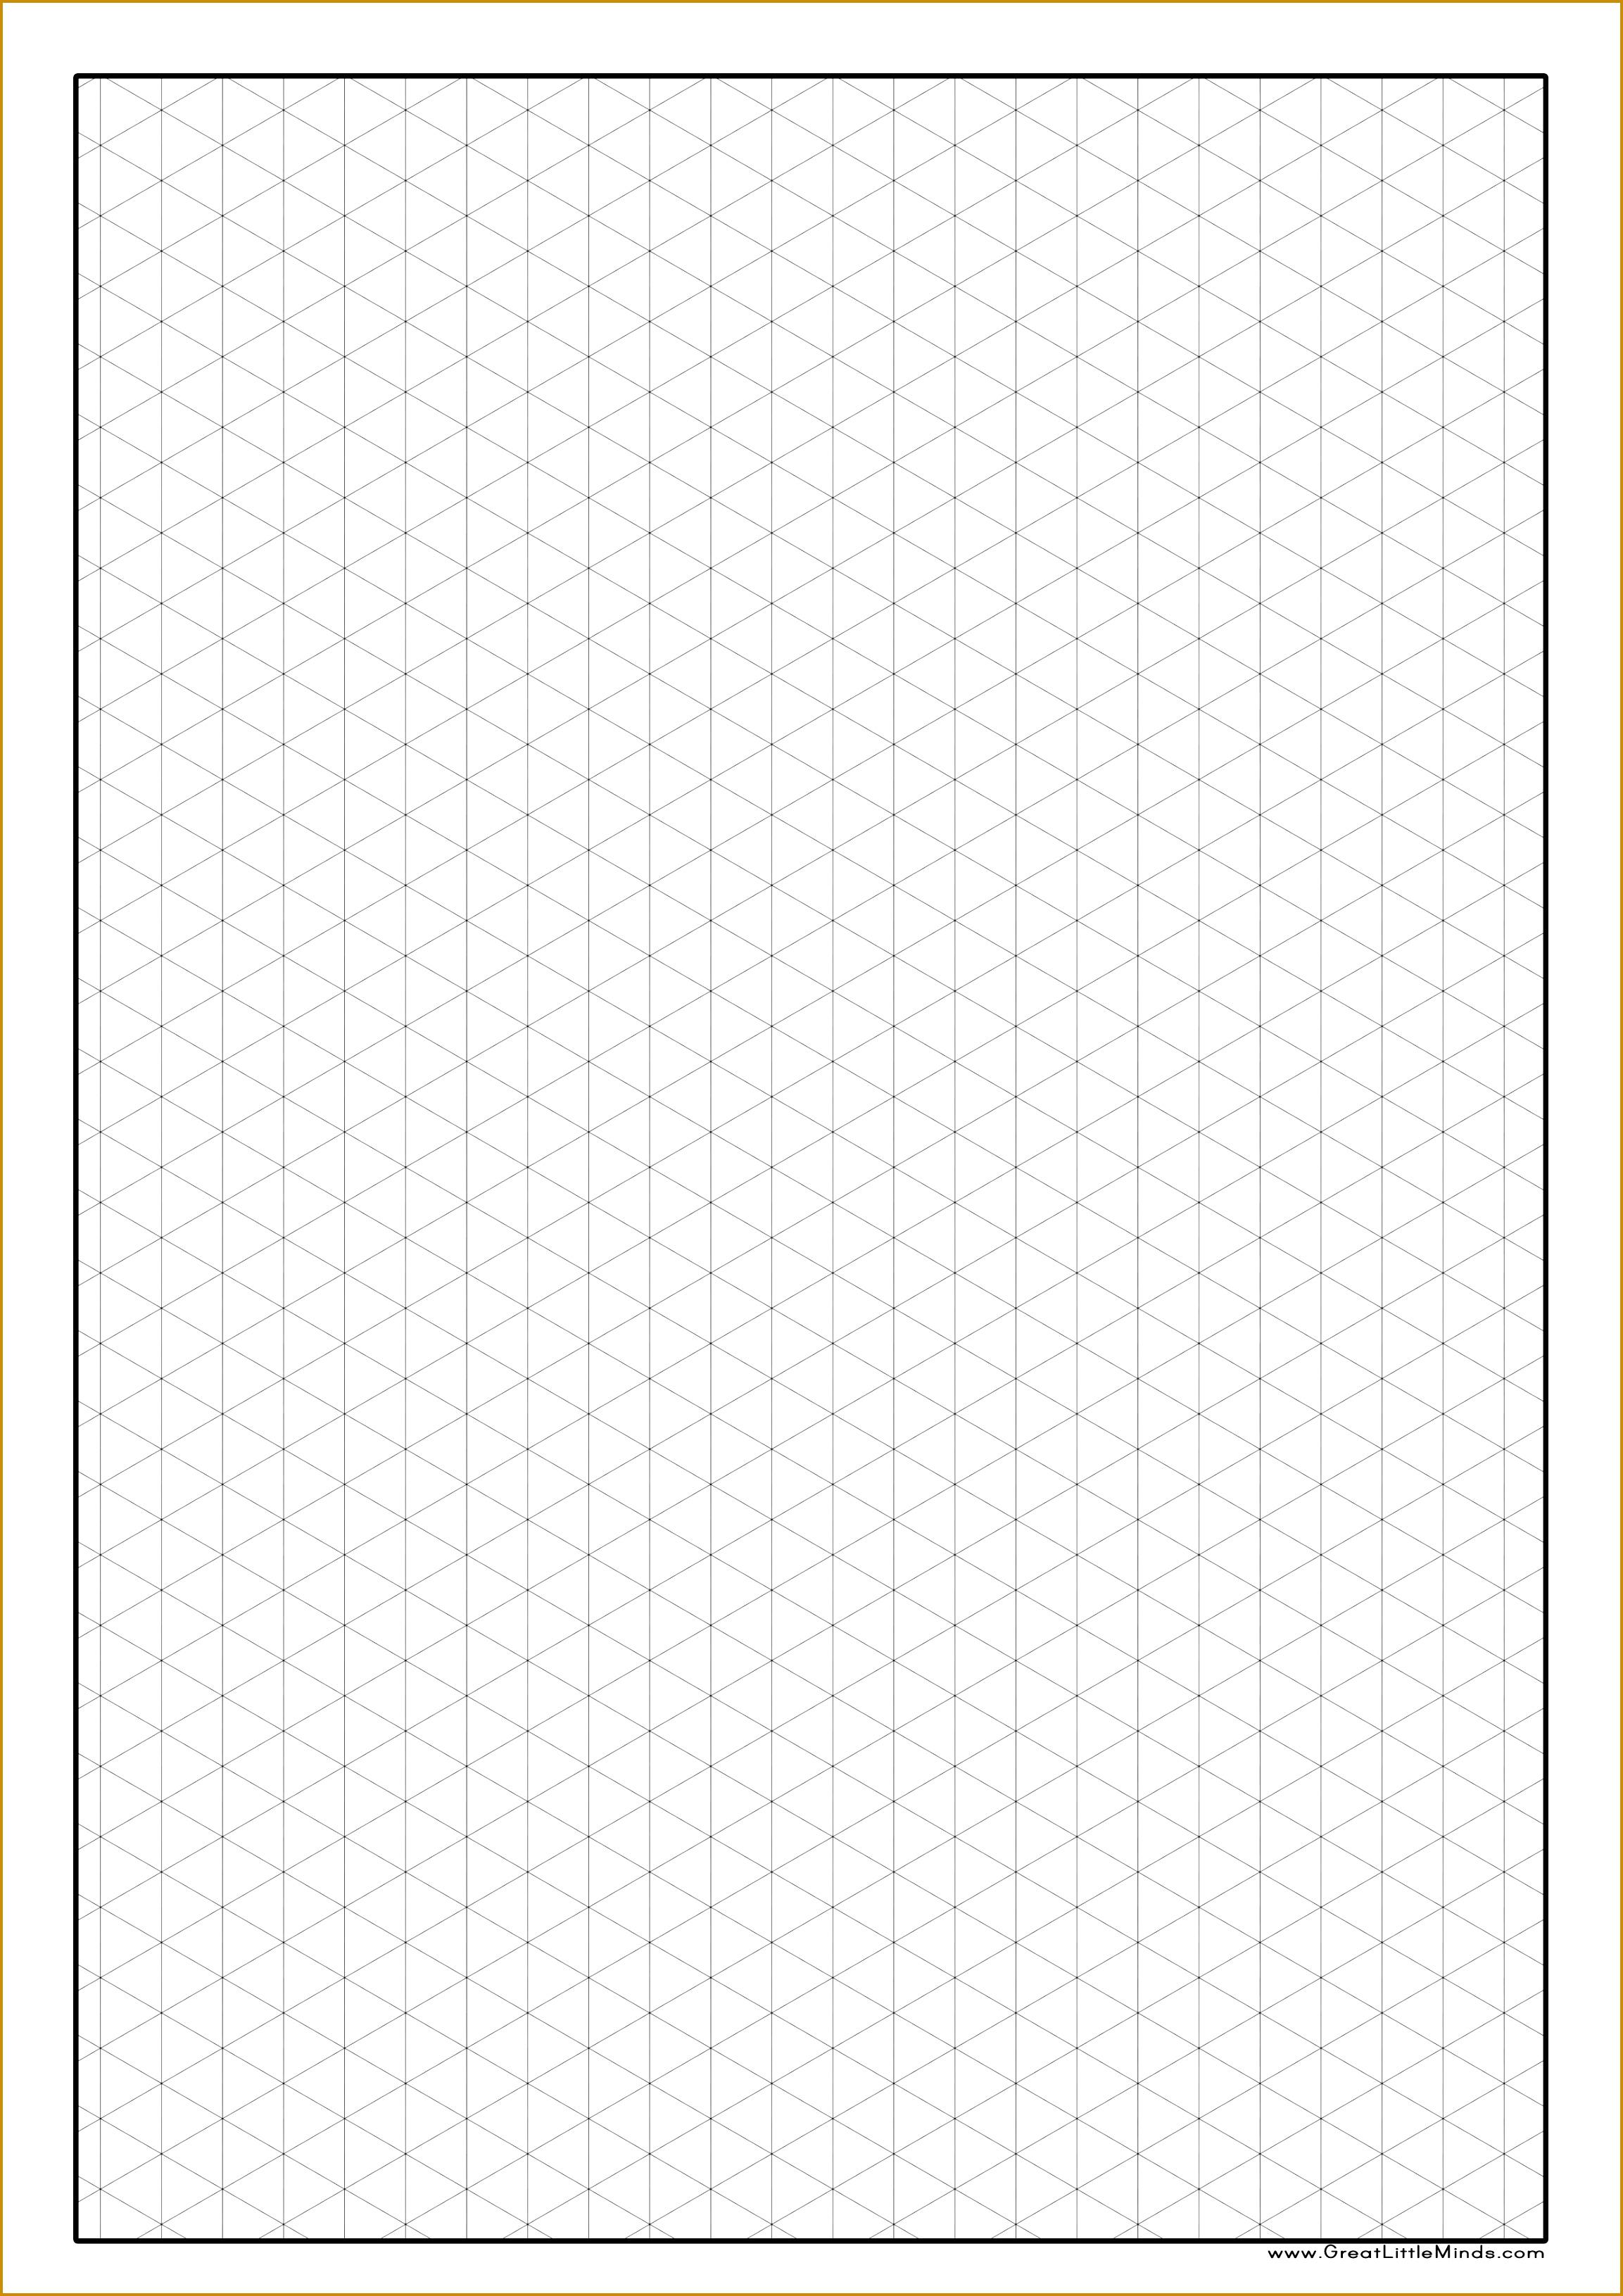 Printable Isometric Graph Paper Isometric PaperIsometric GridIsometric Drawing3d 32622306